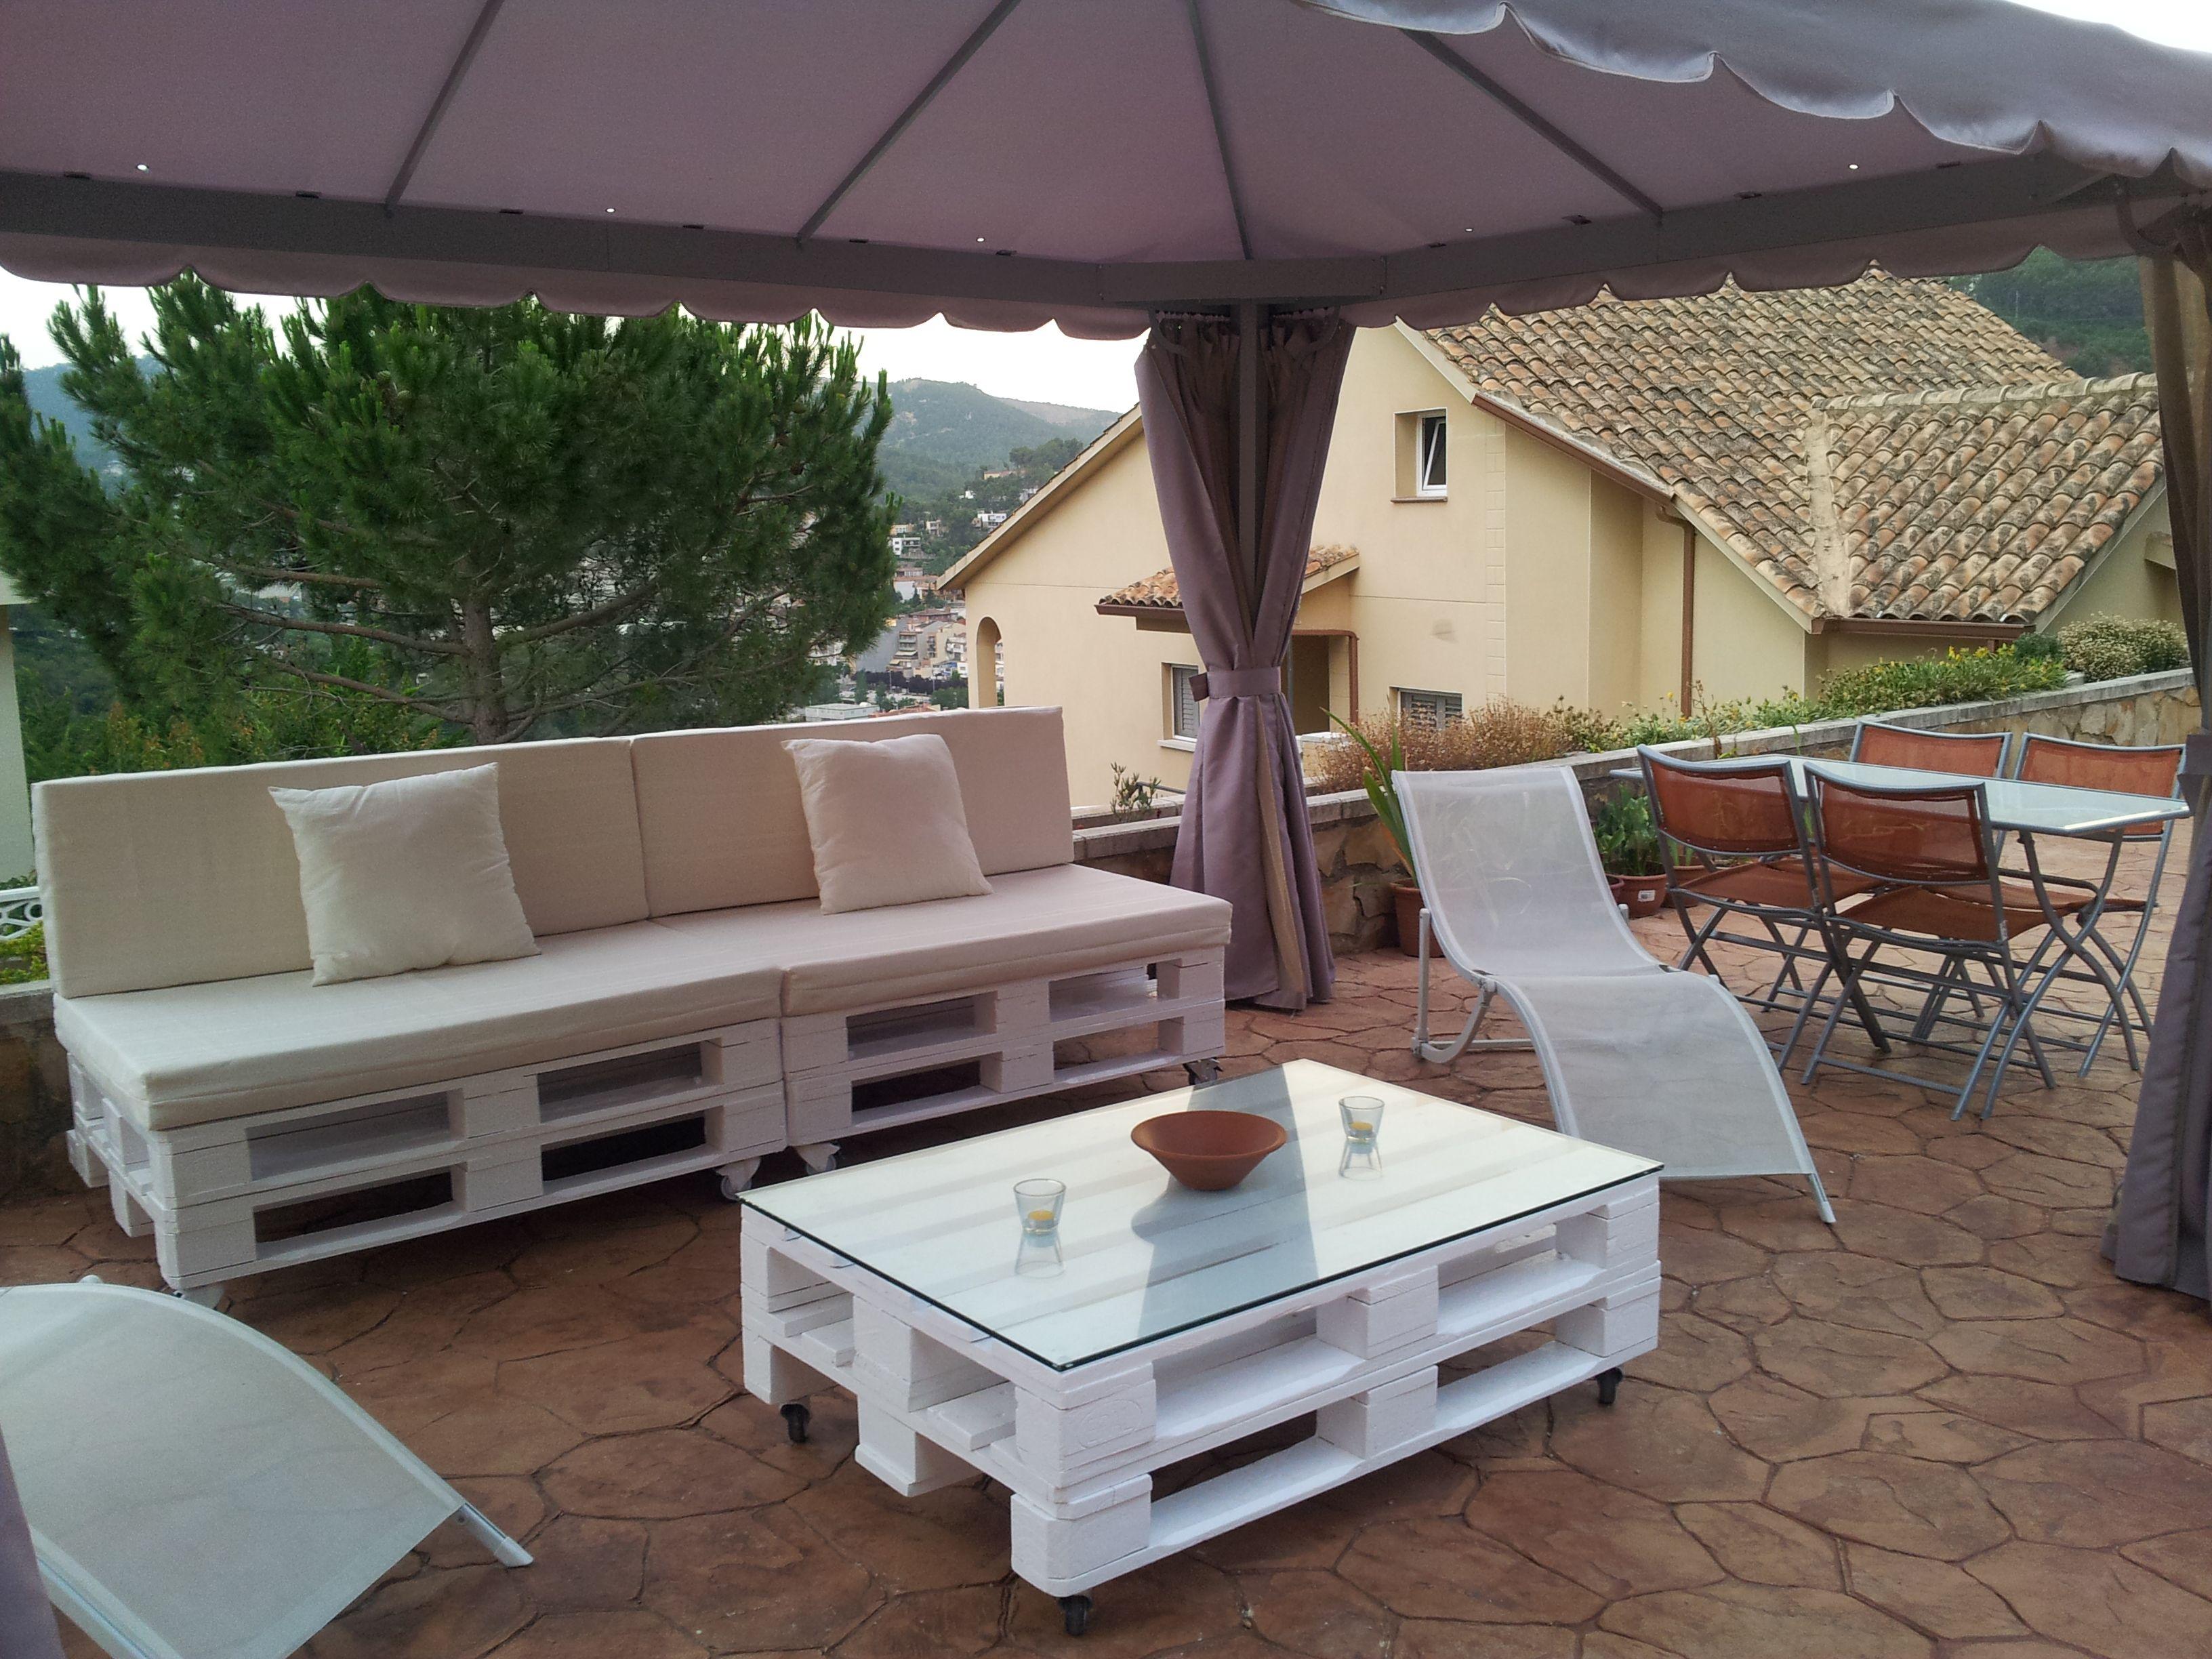 Muebles Jardin Palets Simple Estupendo Muebles Jardin Ikea Por  # Muebles Para Jatdin